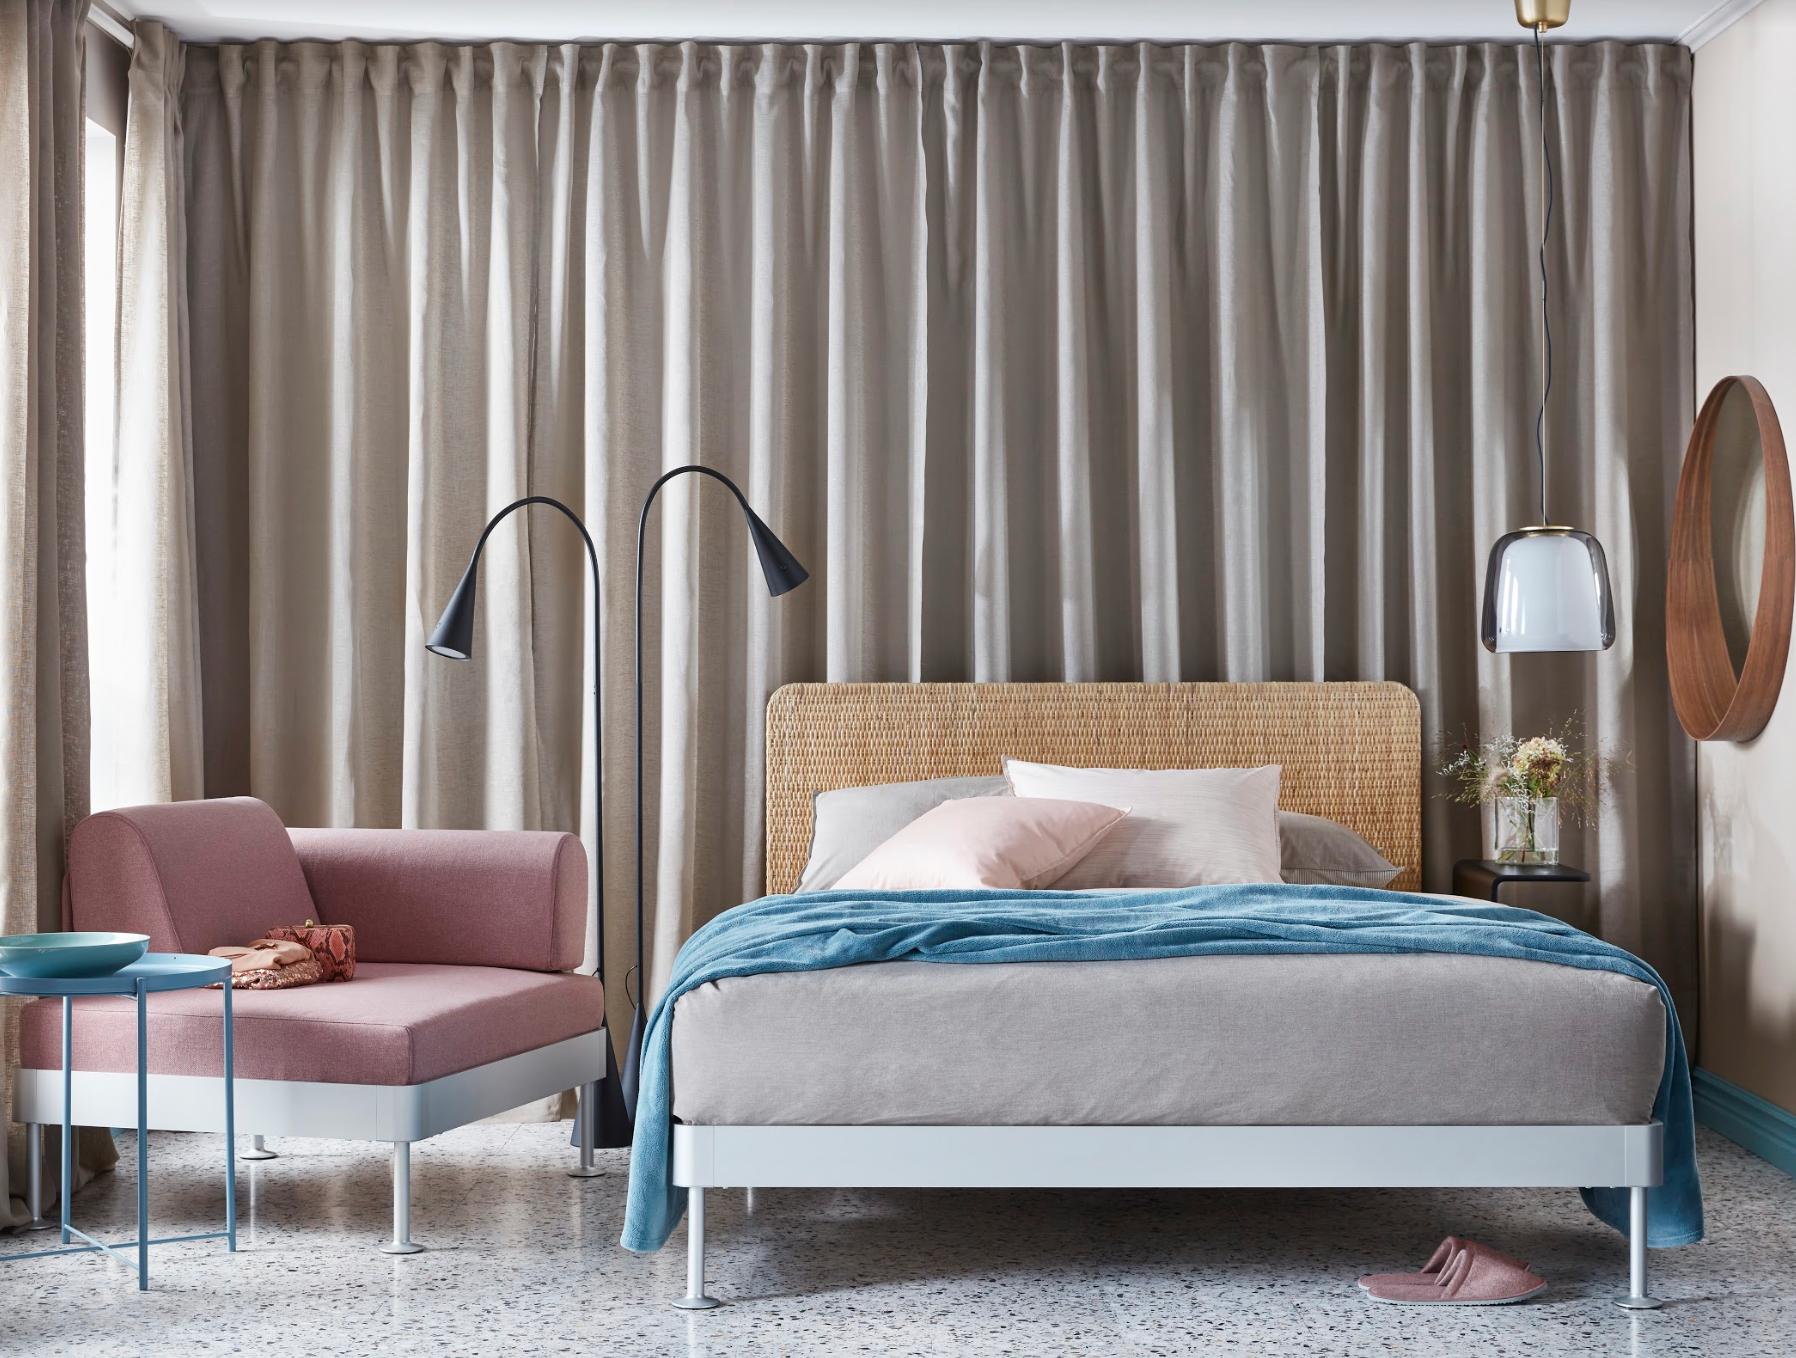 Ikea X Tom Dixons New Delaktig Bed Frame And Headboards For 2019